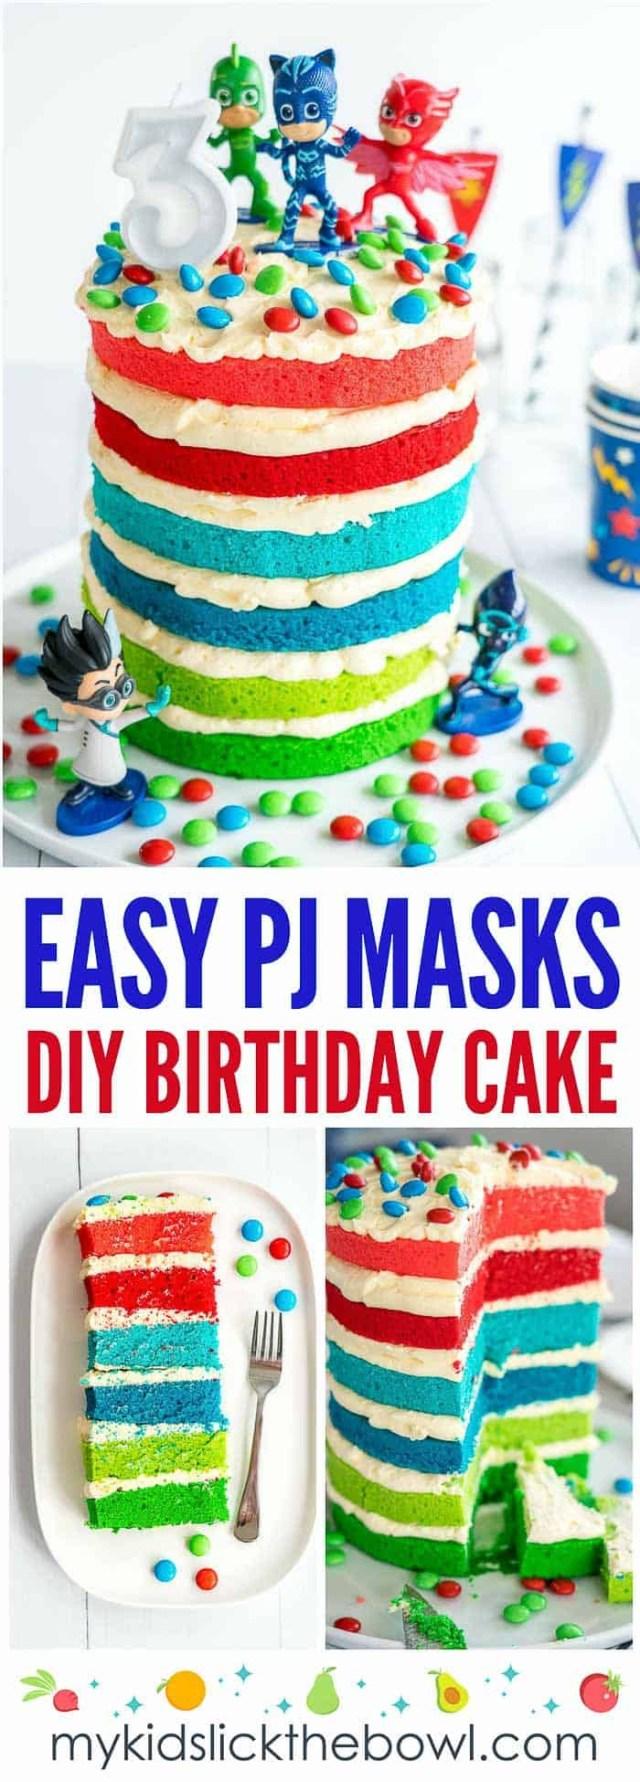 Girls Birthday Cake Pj Masks Cake Easy Diy Birthday Cake For Kids